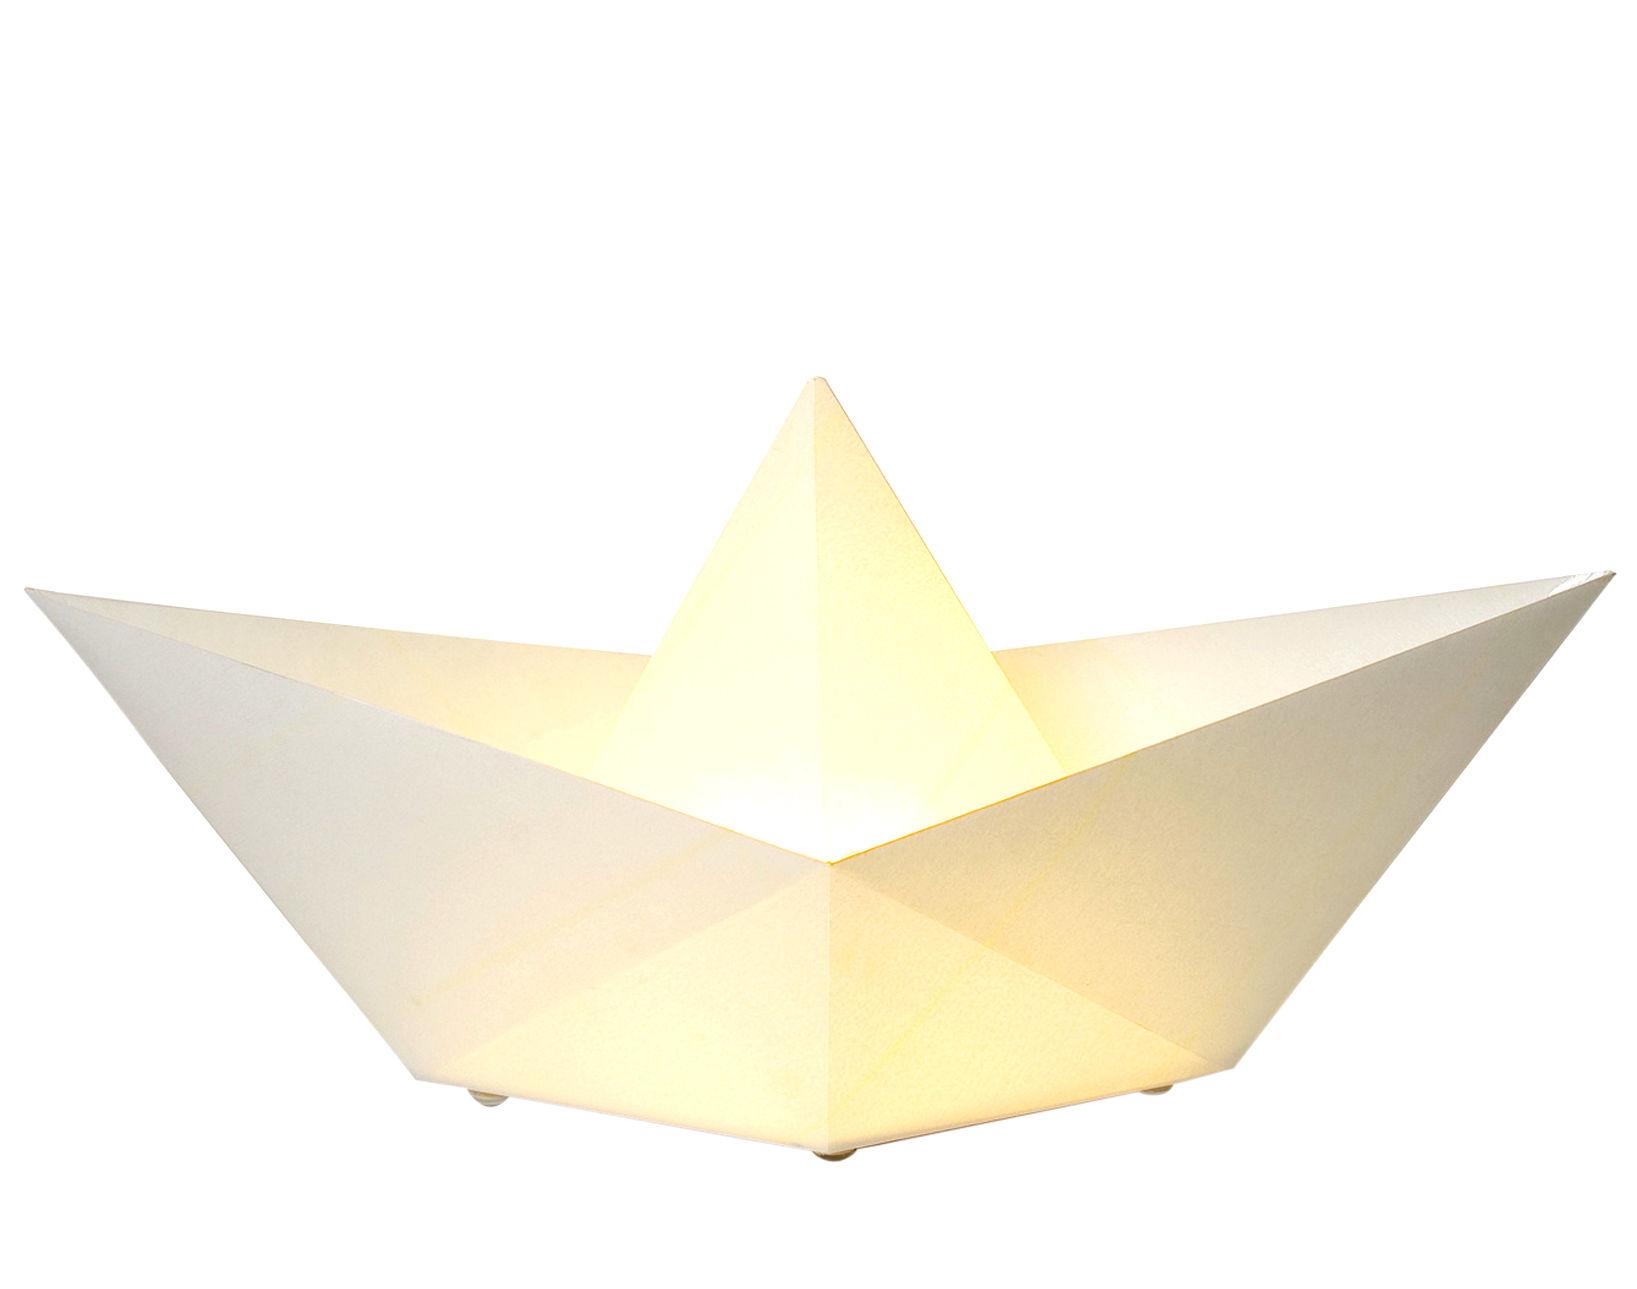 Saily Lamp